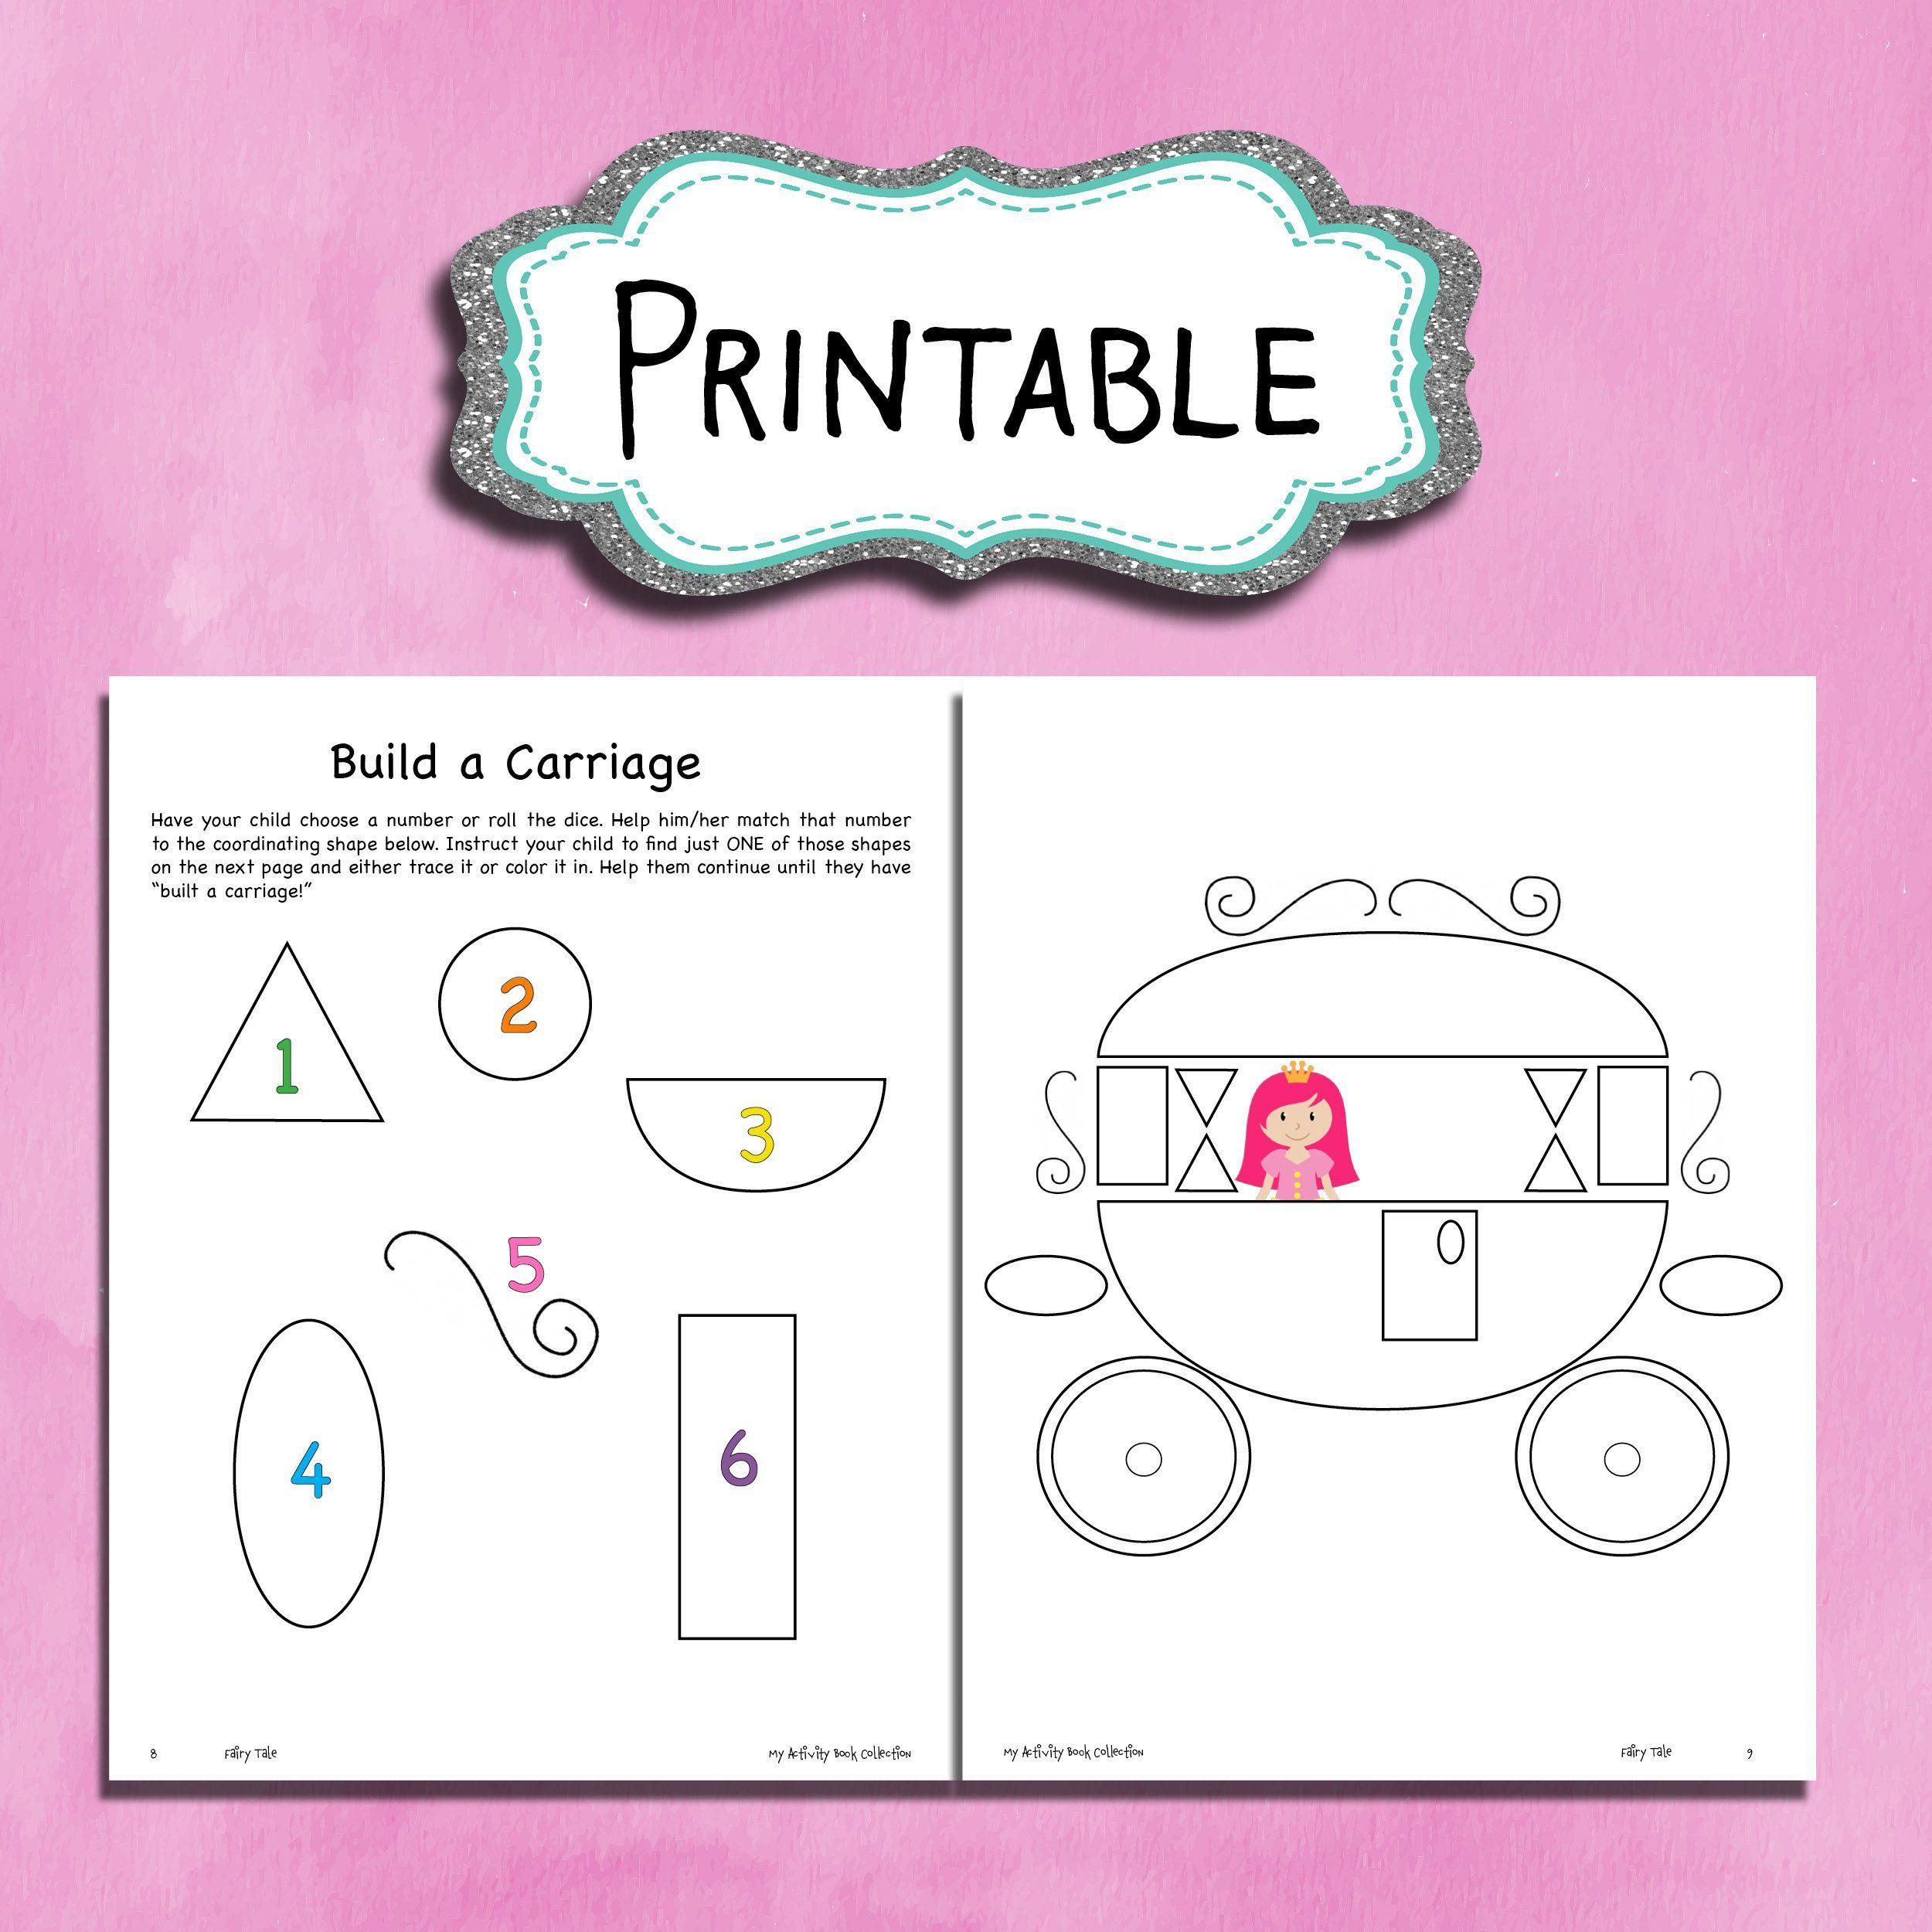 Build A Carriage Printable Worksheet For Kids Princess Etsy Princess Activities Printable Activities For Kids Preschool Creative Art [ 2500 x 2500 Pixel ]